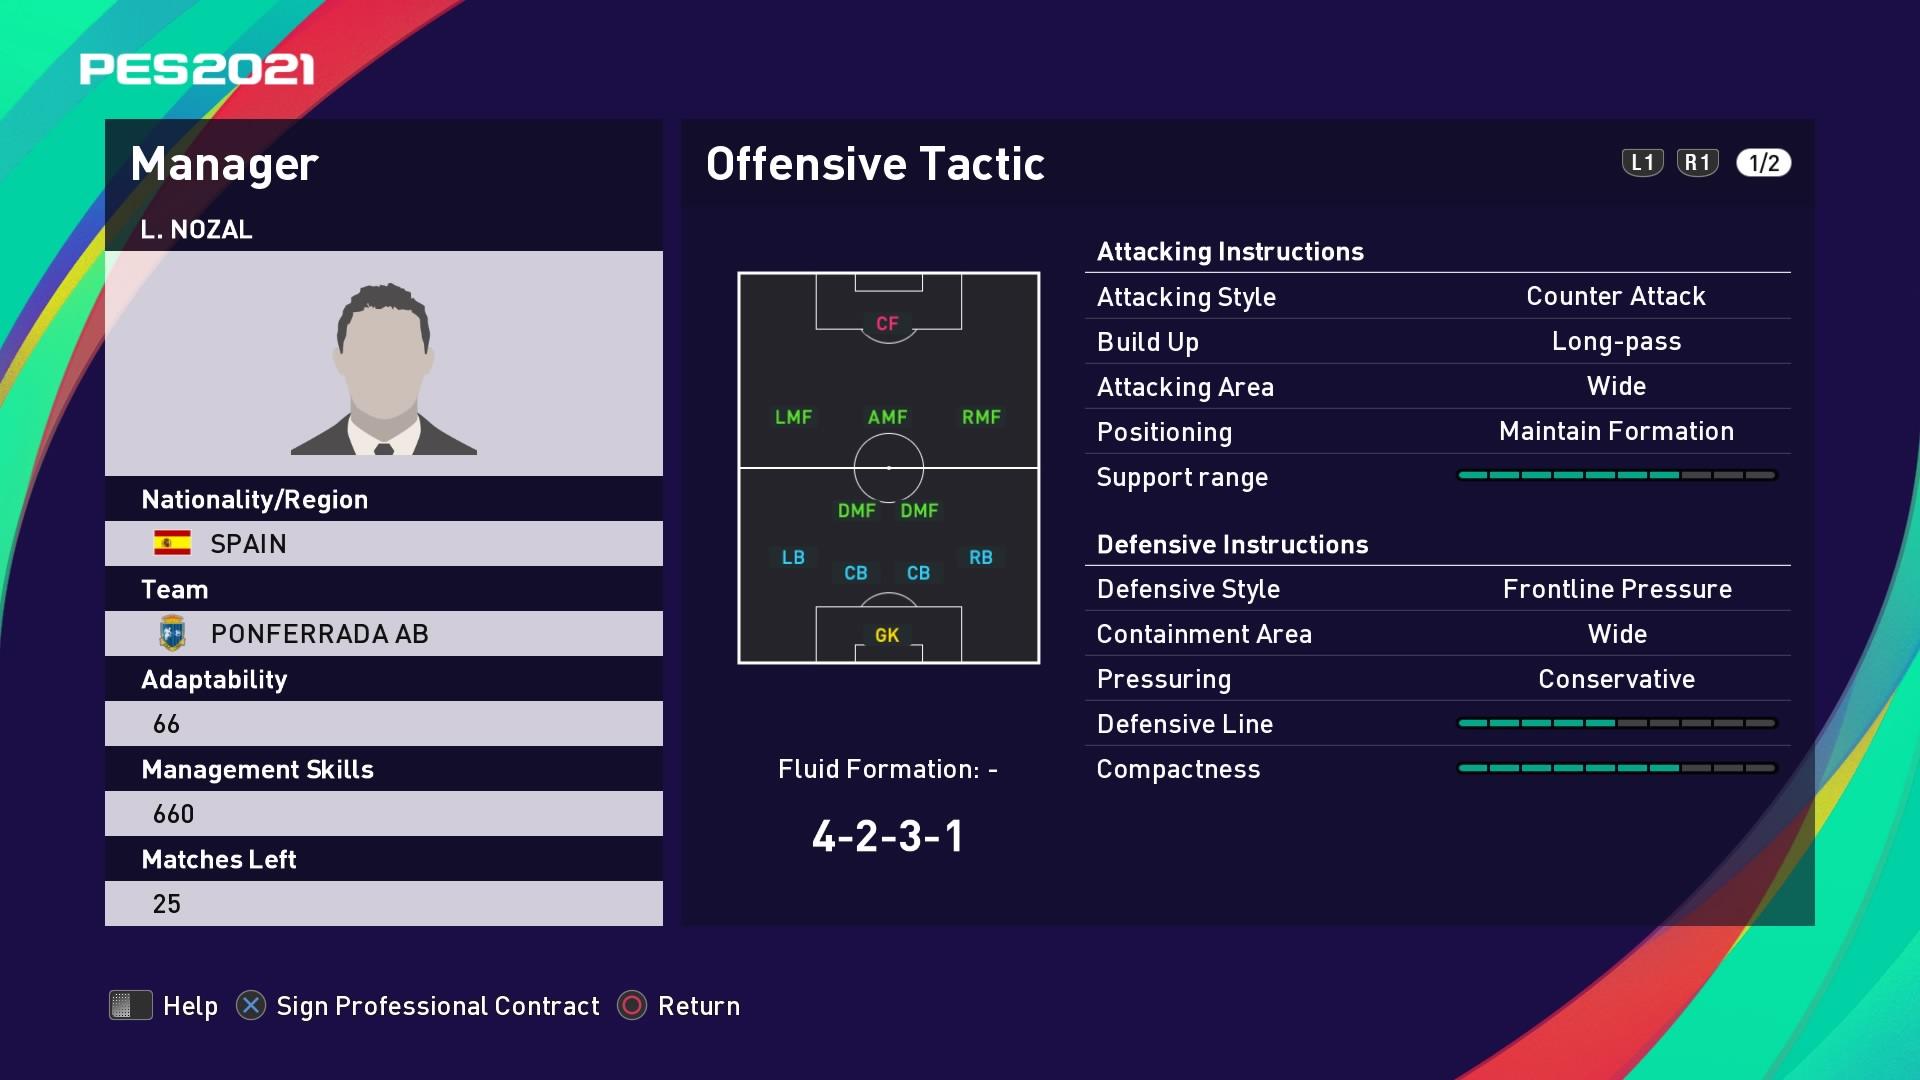 L. Nozal (Bolo) Offensive Tactic in PES 2021 myClub